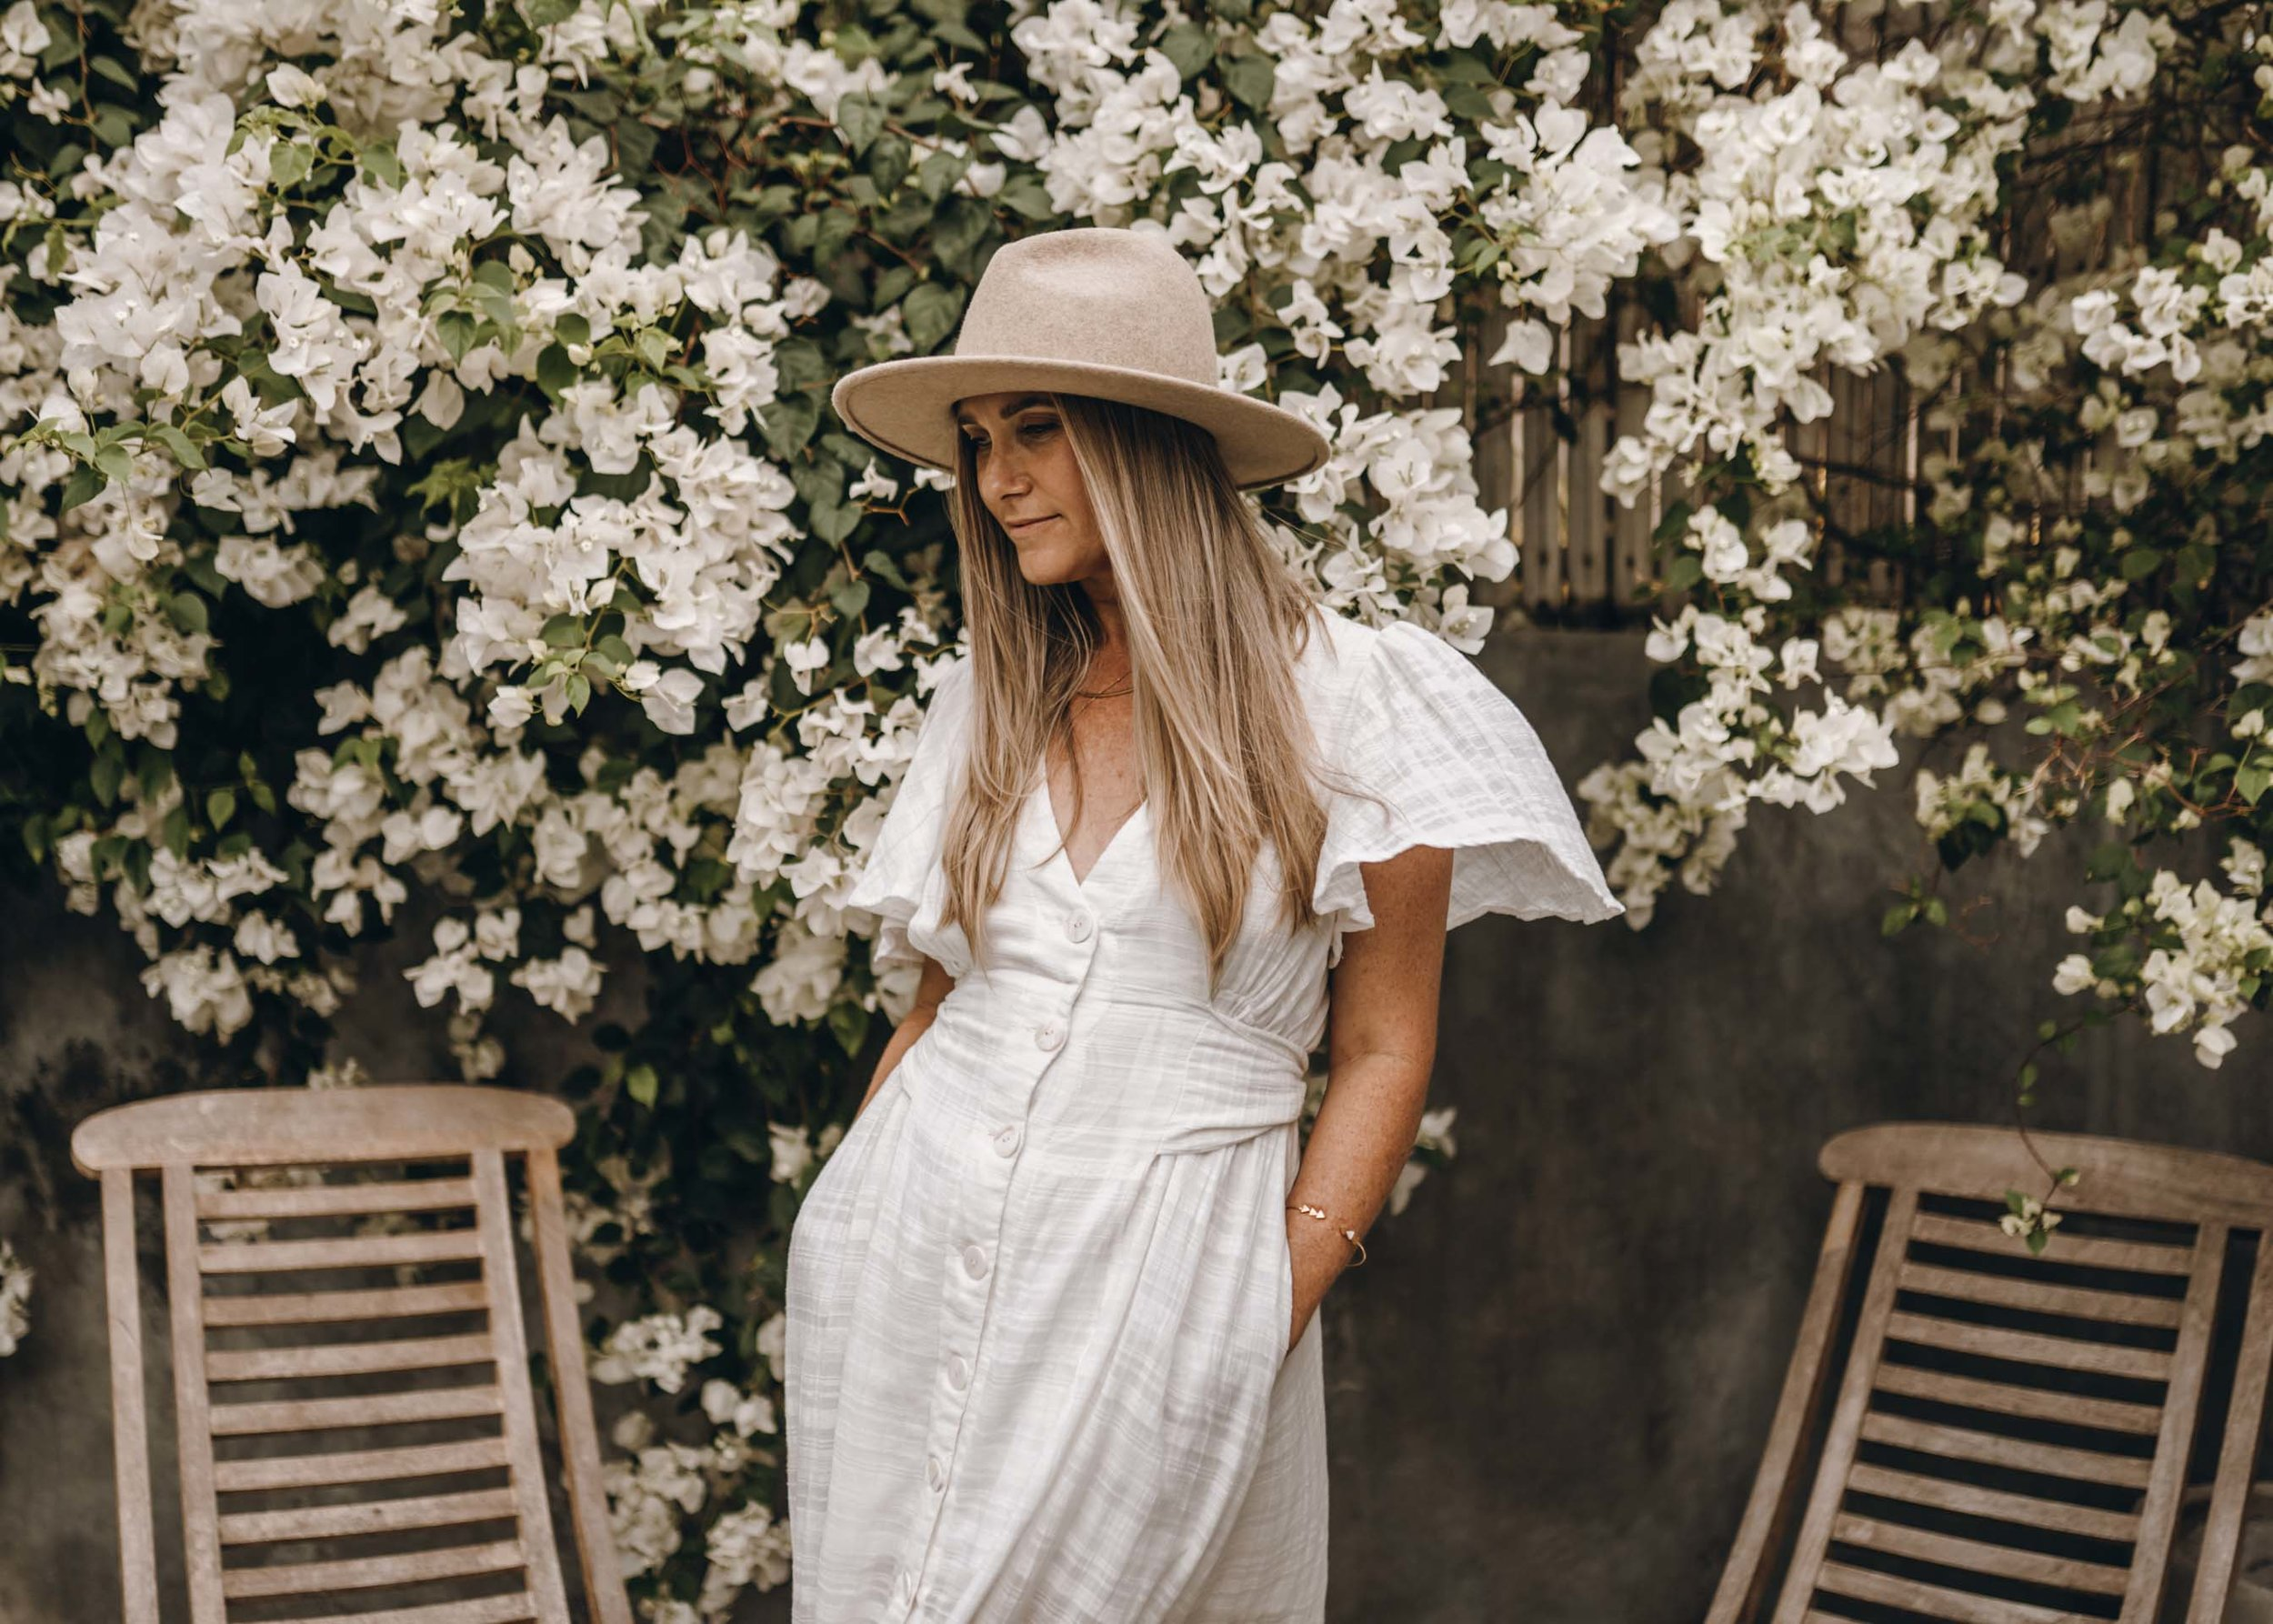 keira-mason-bird-and-kite-garden-white-dress.jpg